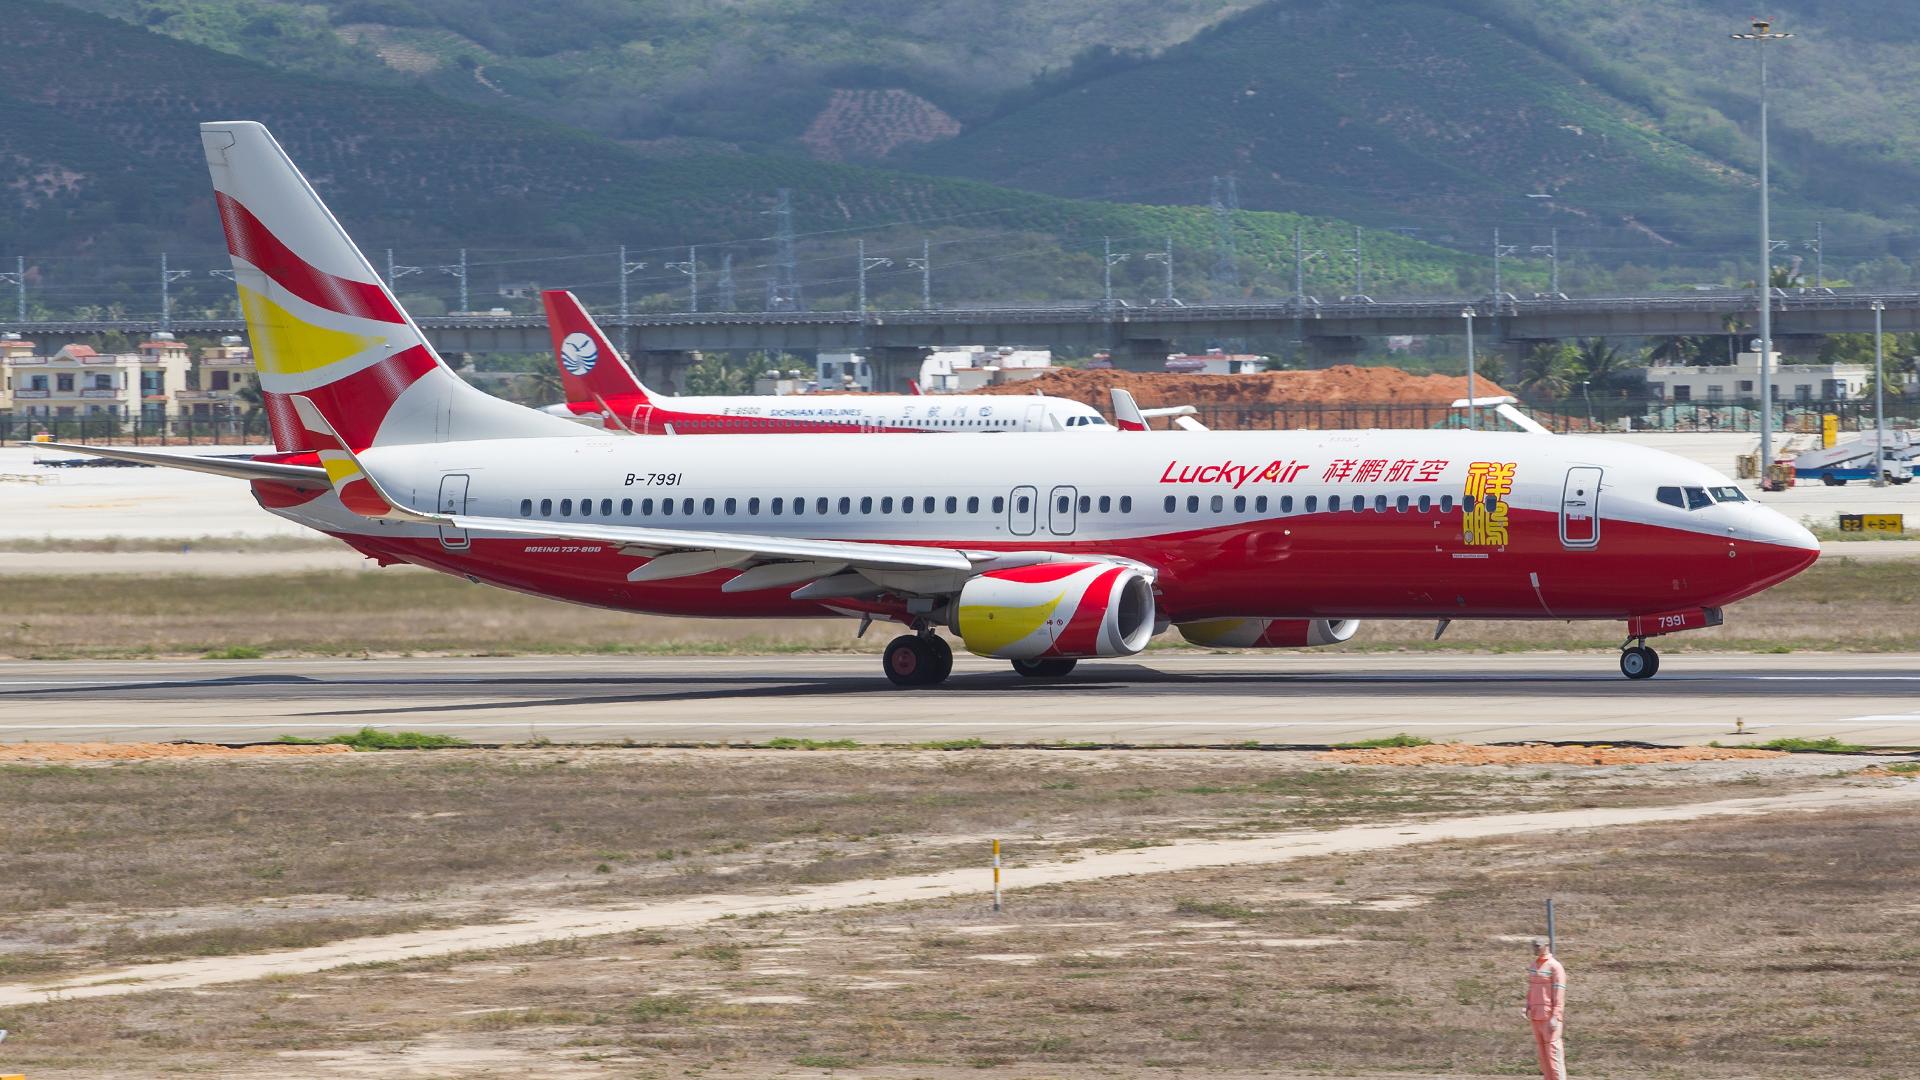 Re:[原创]。。。[SYX]北纬18°的三亚日记。。。(二) BOEING 737-800 B-7991 中国三亚凤凰国际机场